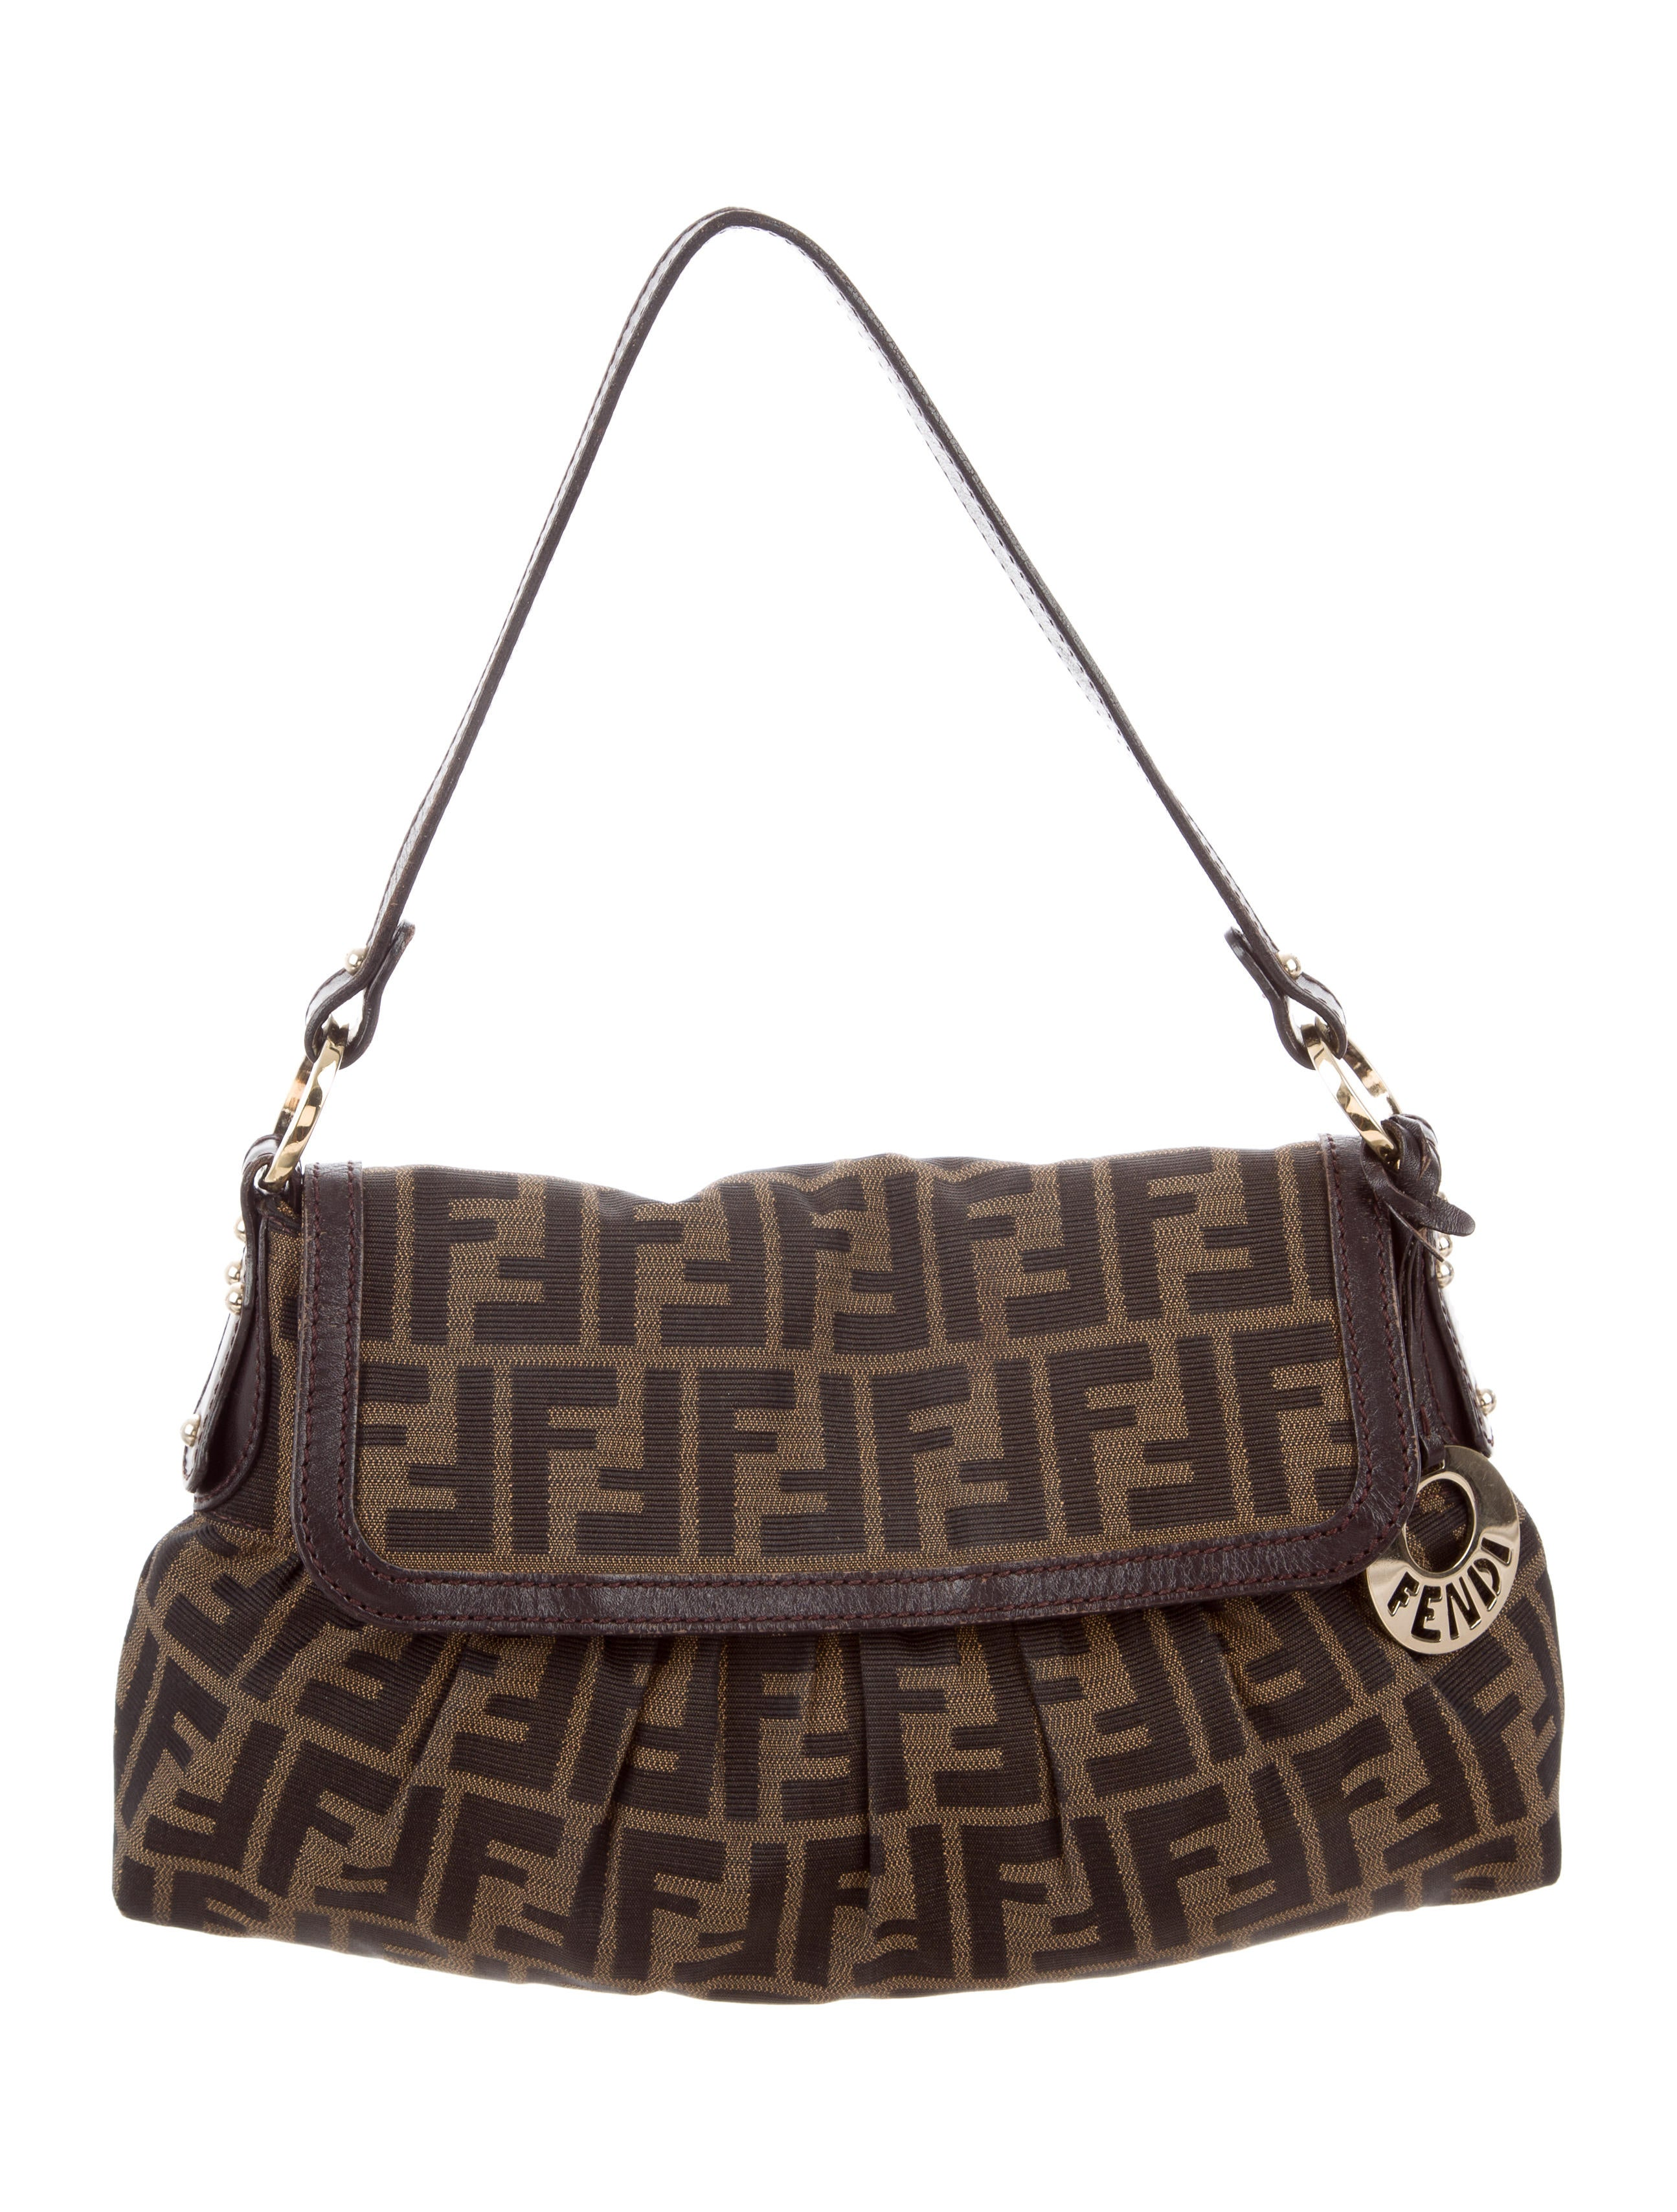 Fendi Bags - Designer Handbag & Purse Chat.. The Bag Forum